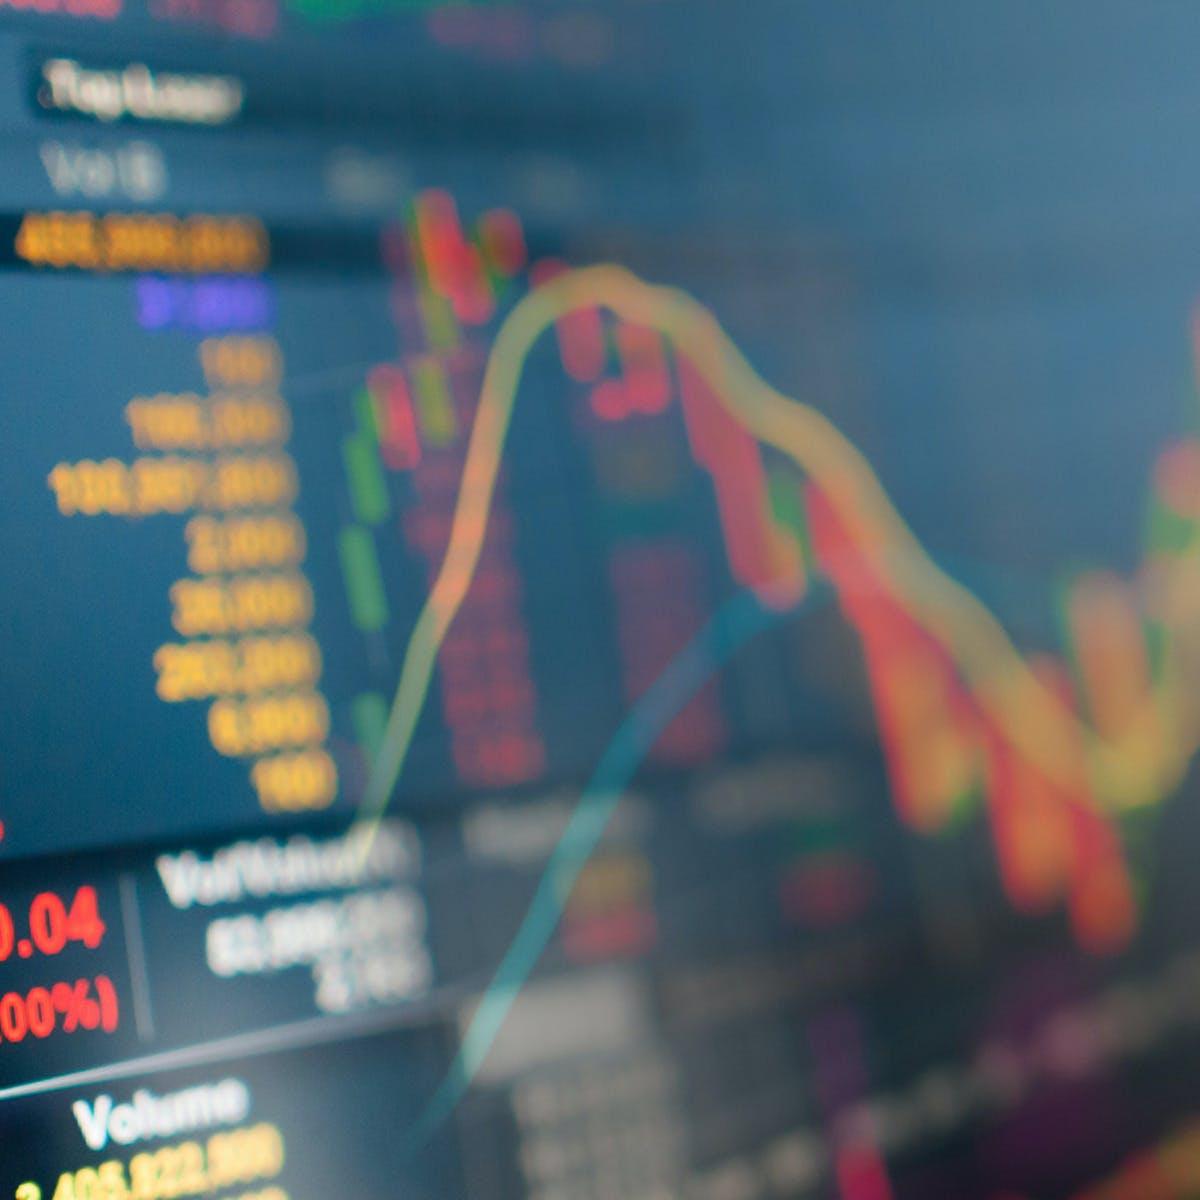 Capstone: Build a Winning Investment Portfolio